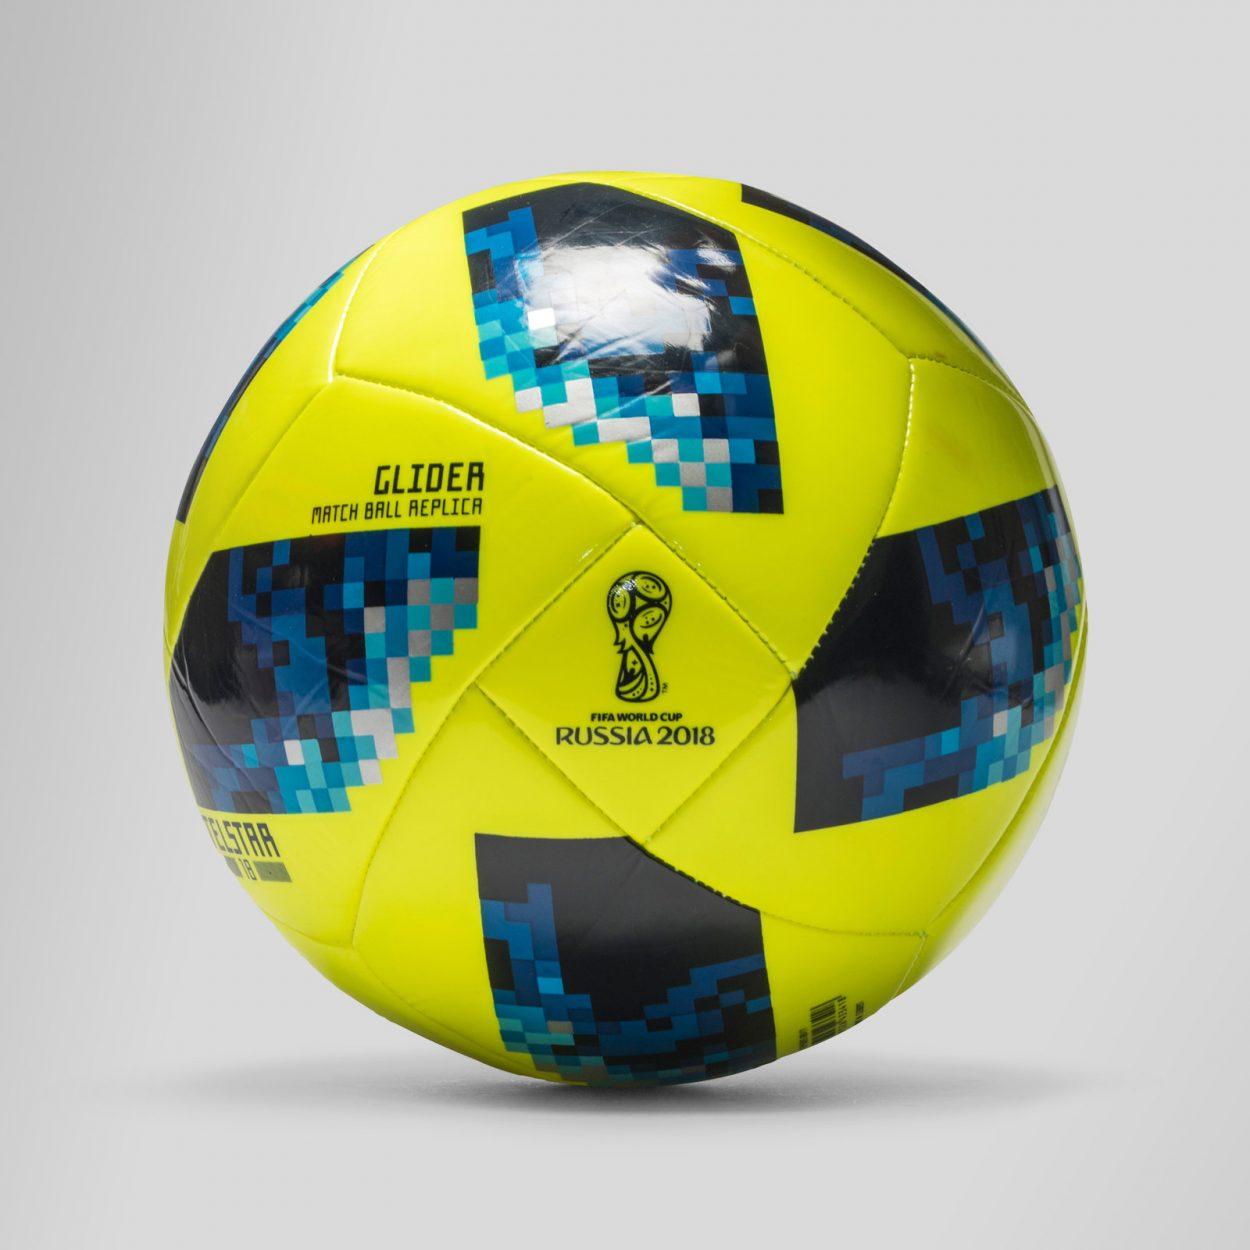 Fifa World Cup 2018 Glider Training Football  Compare. Warning Label Stickers. Branch Logo. Aituc Logo. Lamp Logo. Jazzmaster Stickers. Panic Attacks Signs. Freedom Tunnel Murals. Blacksmith Logo